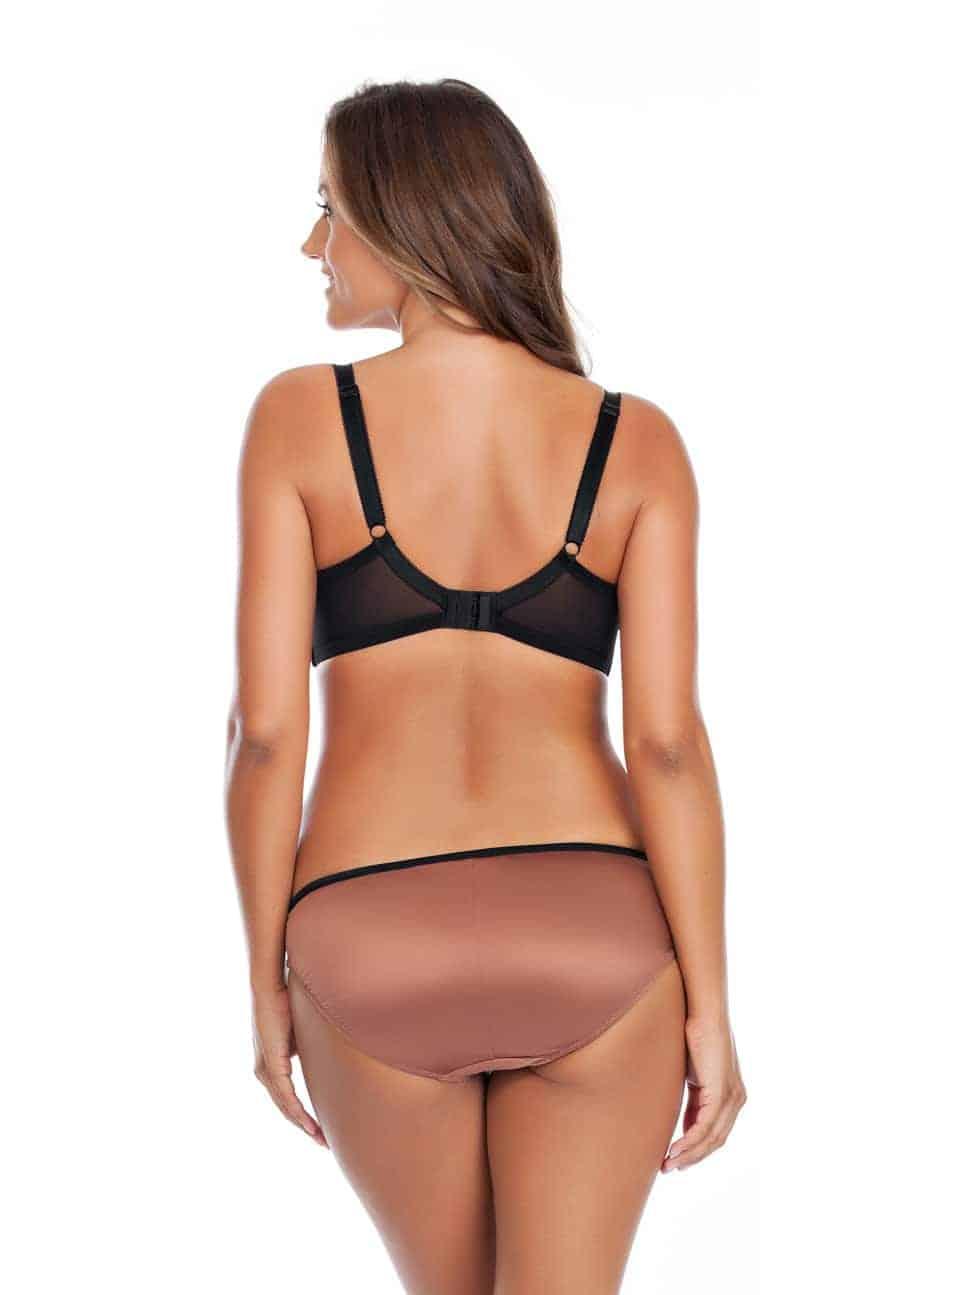 Charlotte PaddedBra6901 Bikini6905 Bronze Back - Charlotte Padded Bra - Bronze - 6901